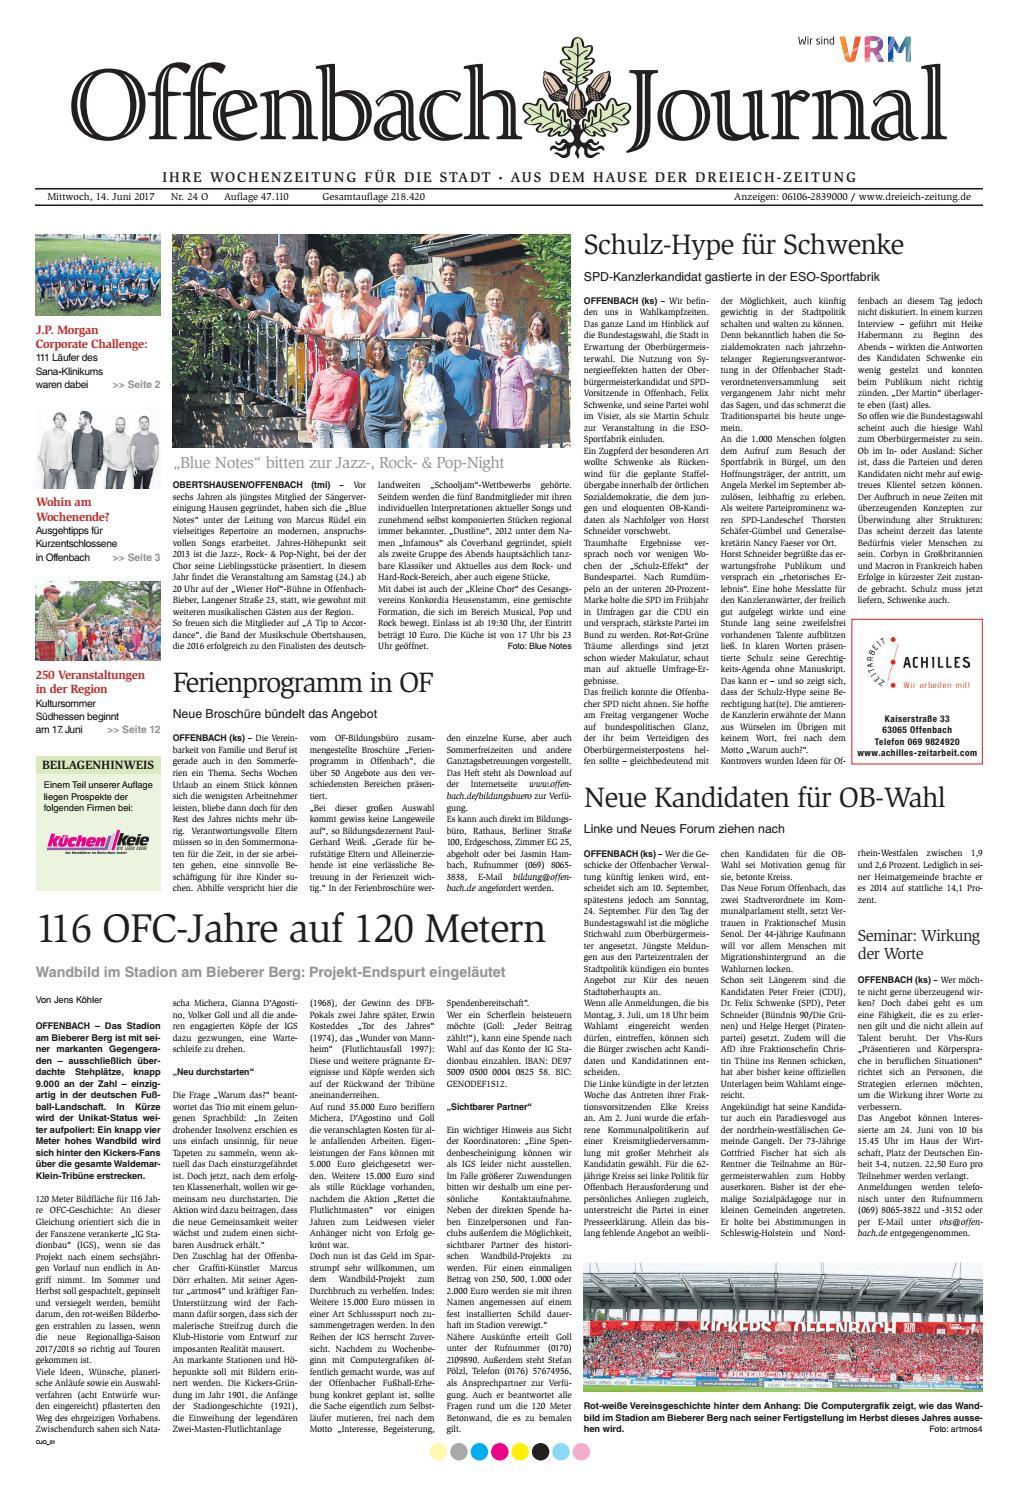 Oj 024 by Dreieich-Zeitung/Offenbach-Journal - issuu